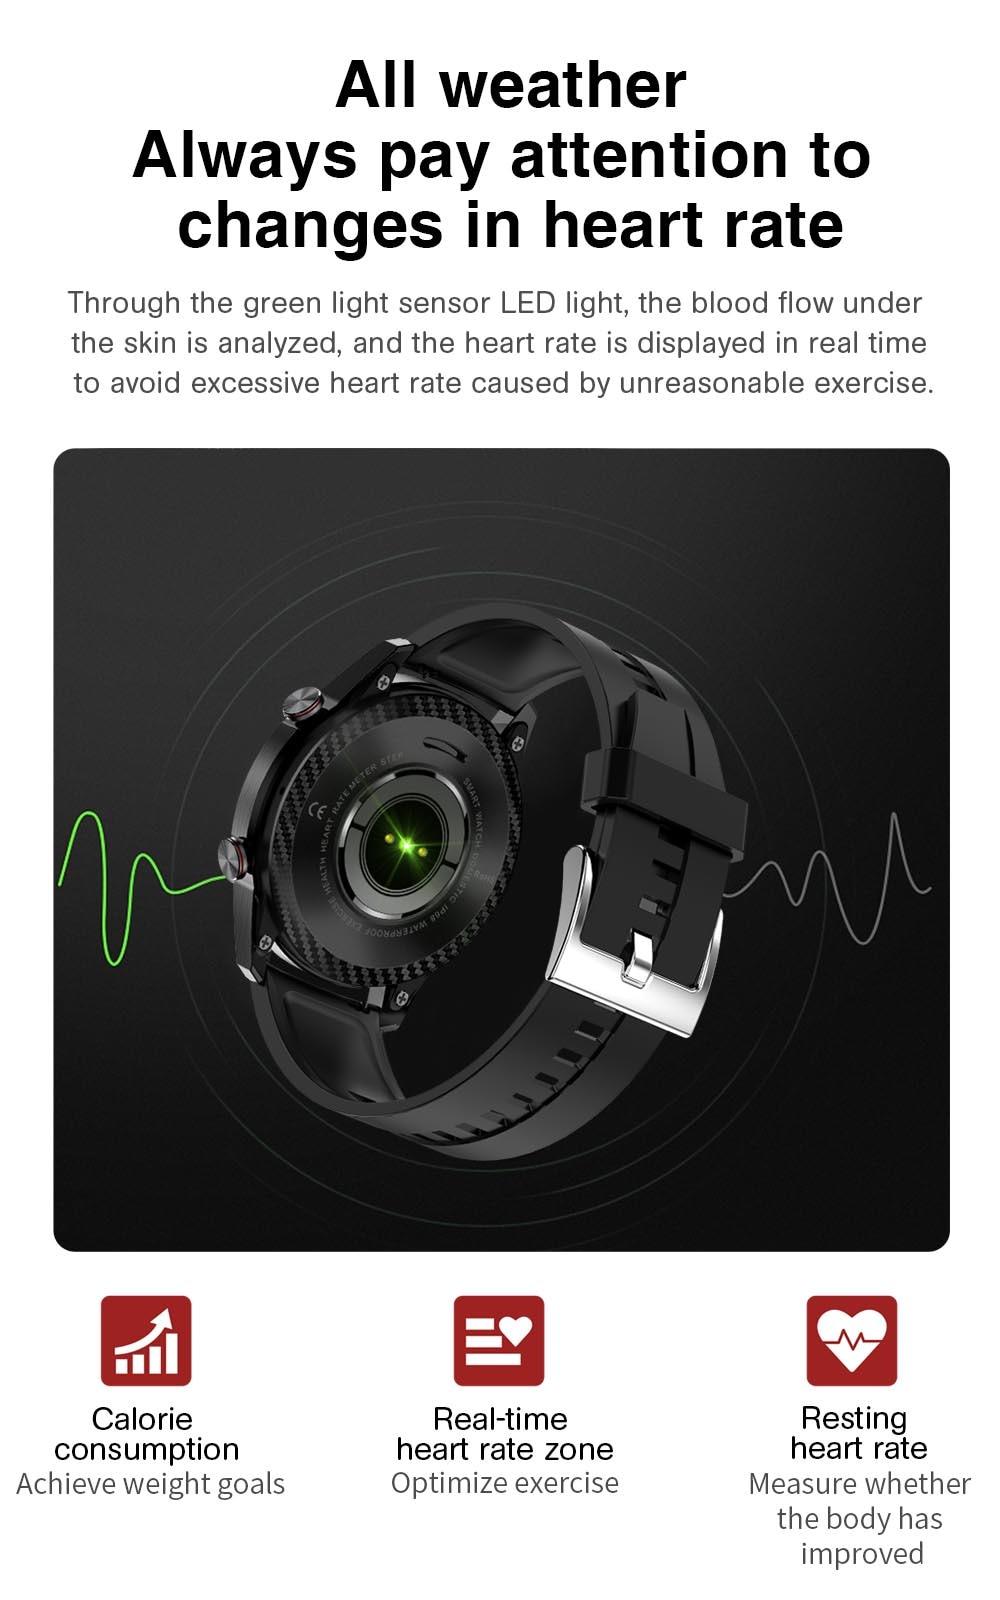 Hf542f6f281074547945a0ea144642713m TK2-8 Smart Watch For Men Bluetooth Call IP68 Waterproof Blood Pressure Heart Rate Monitor New SmartWatch Sports Fitness Tracker